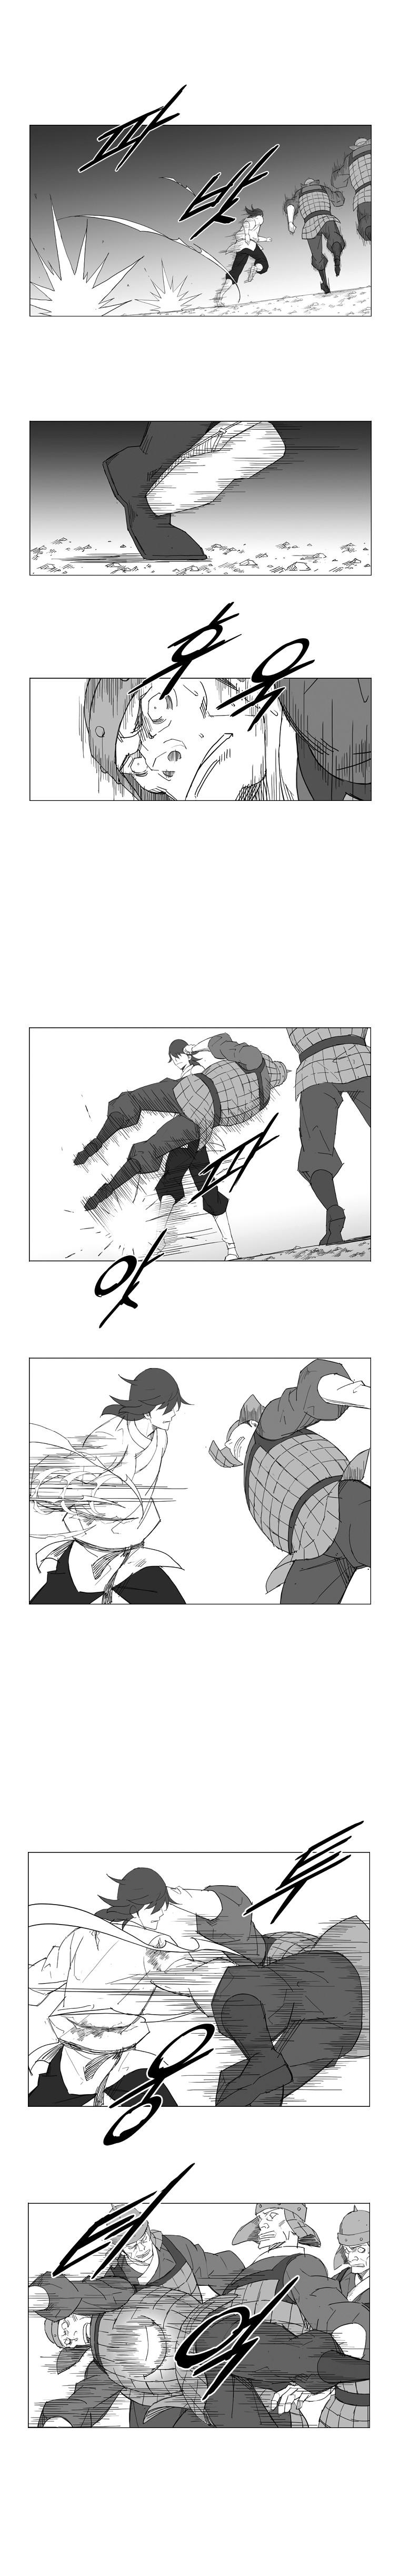 https://r1.ninemanga.com/comics/pic2/39/28263/317432/1485716718171.jpg Page 3